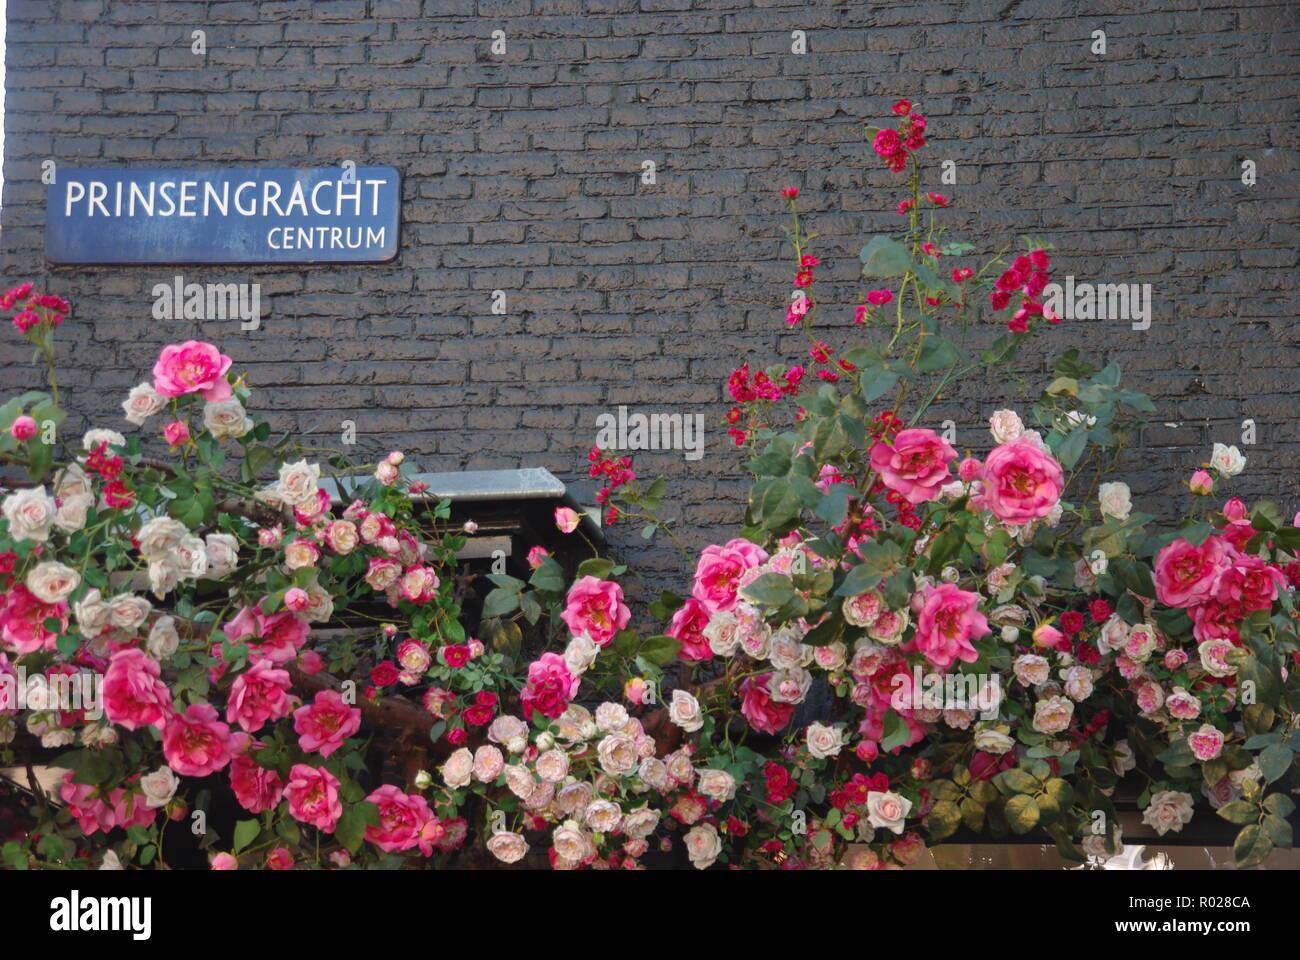 Roses on Prinsengracht Centrum, Amsterdam - Stock Image